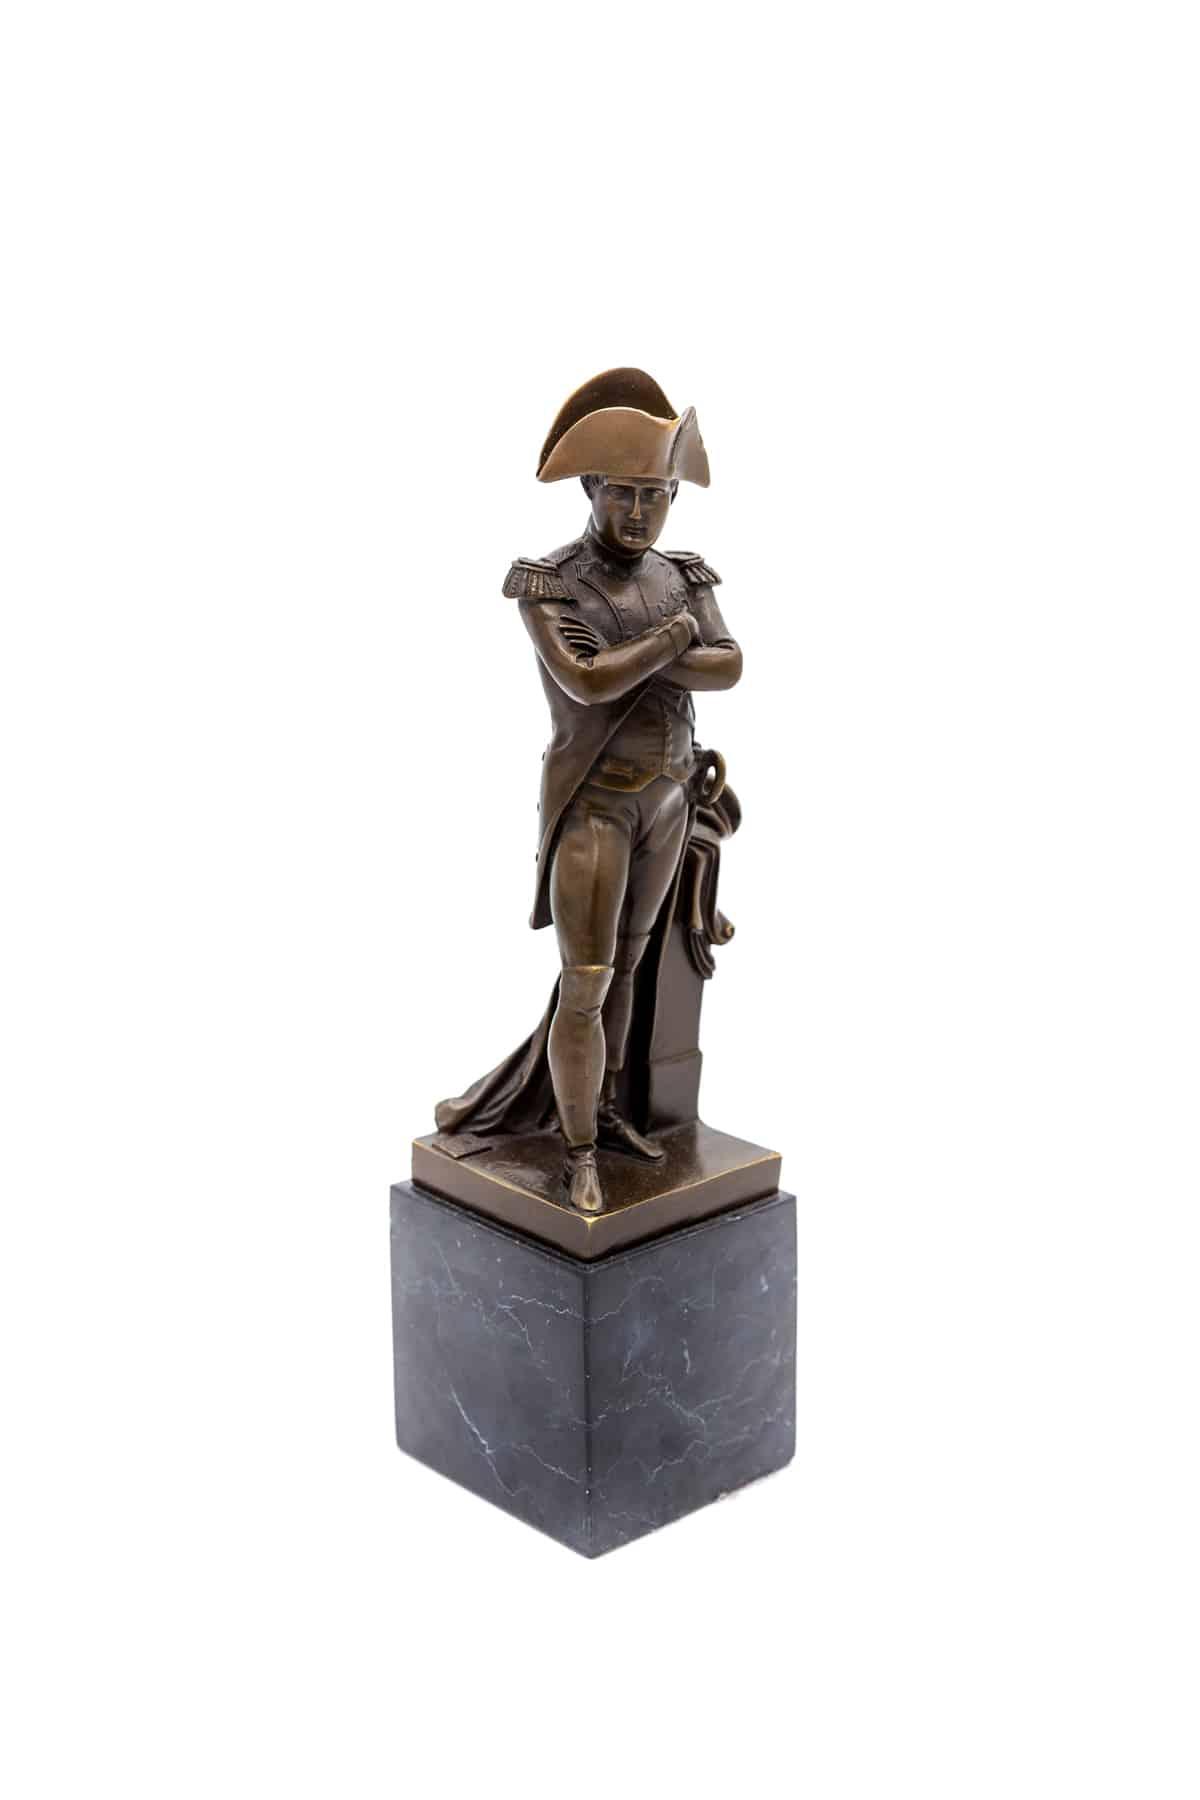 bronzovaya statuehtka napoleon bonapart